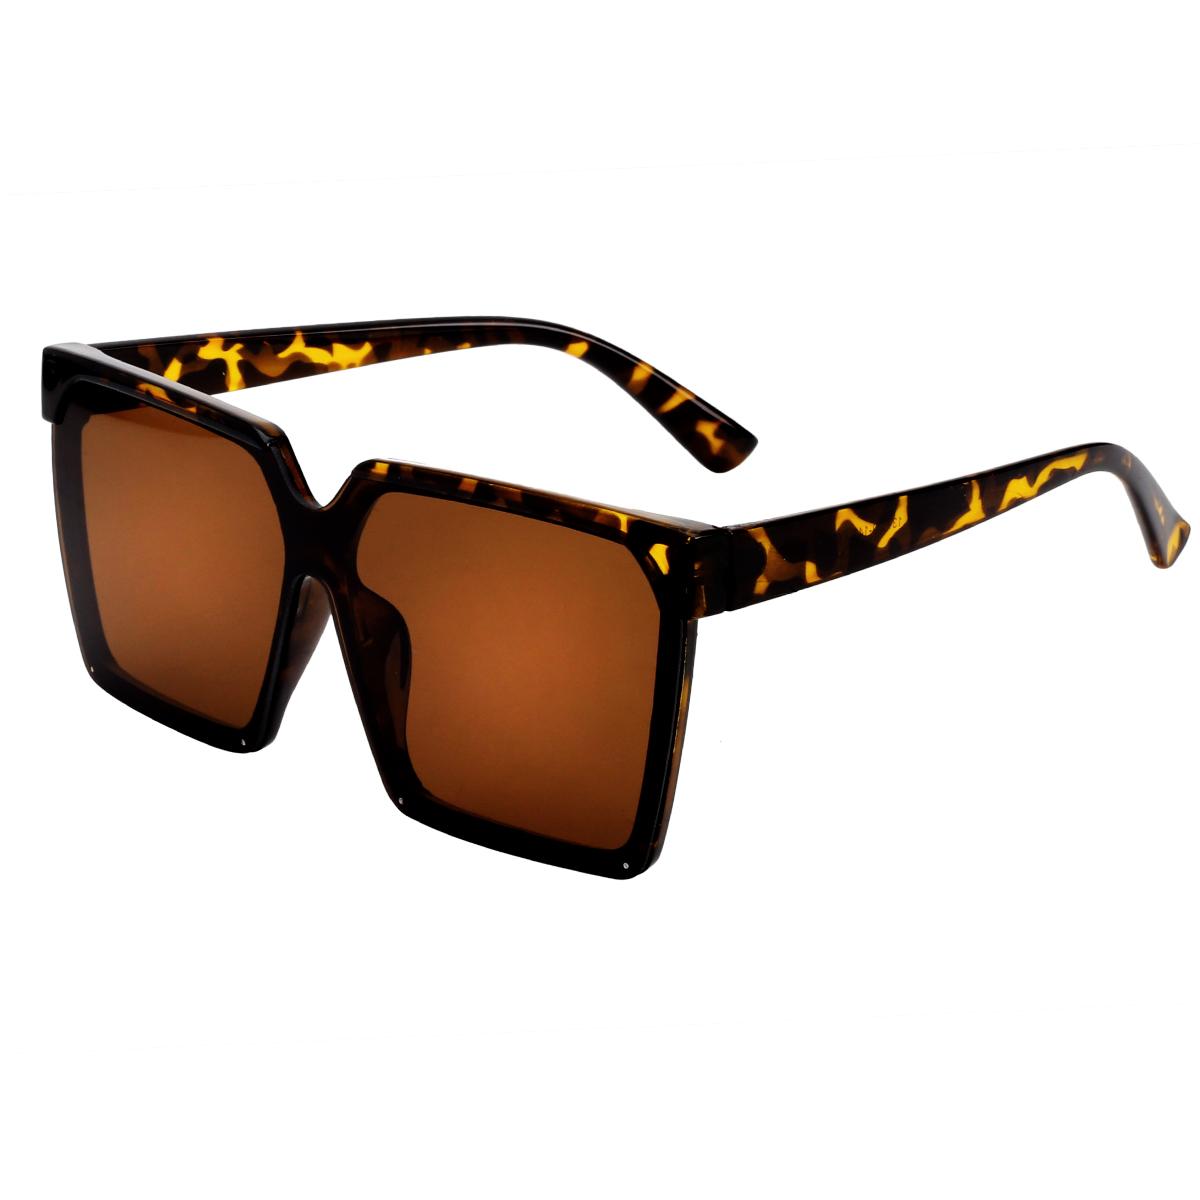 Sunglasses Like a Boss